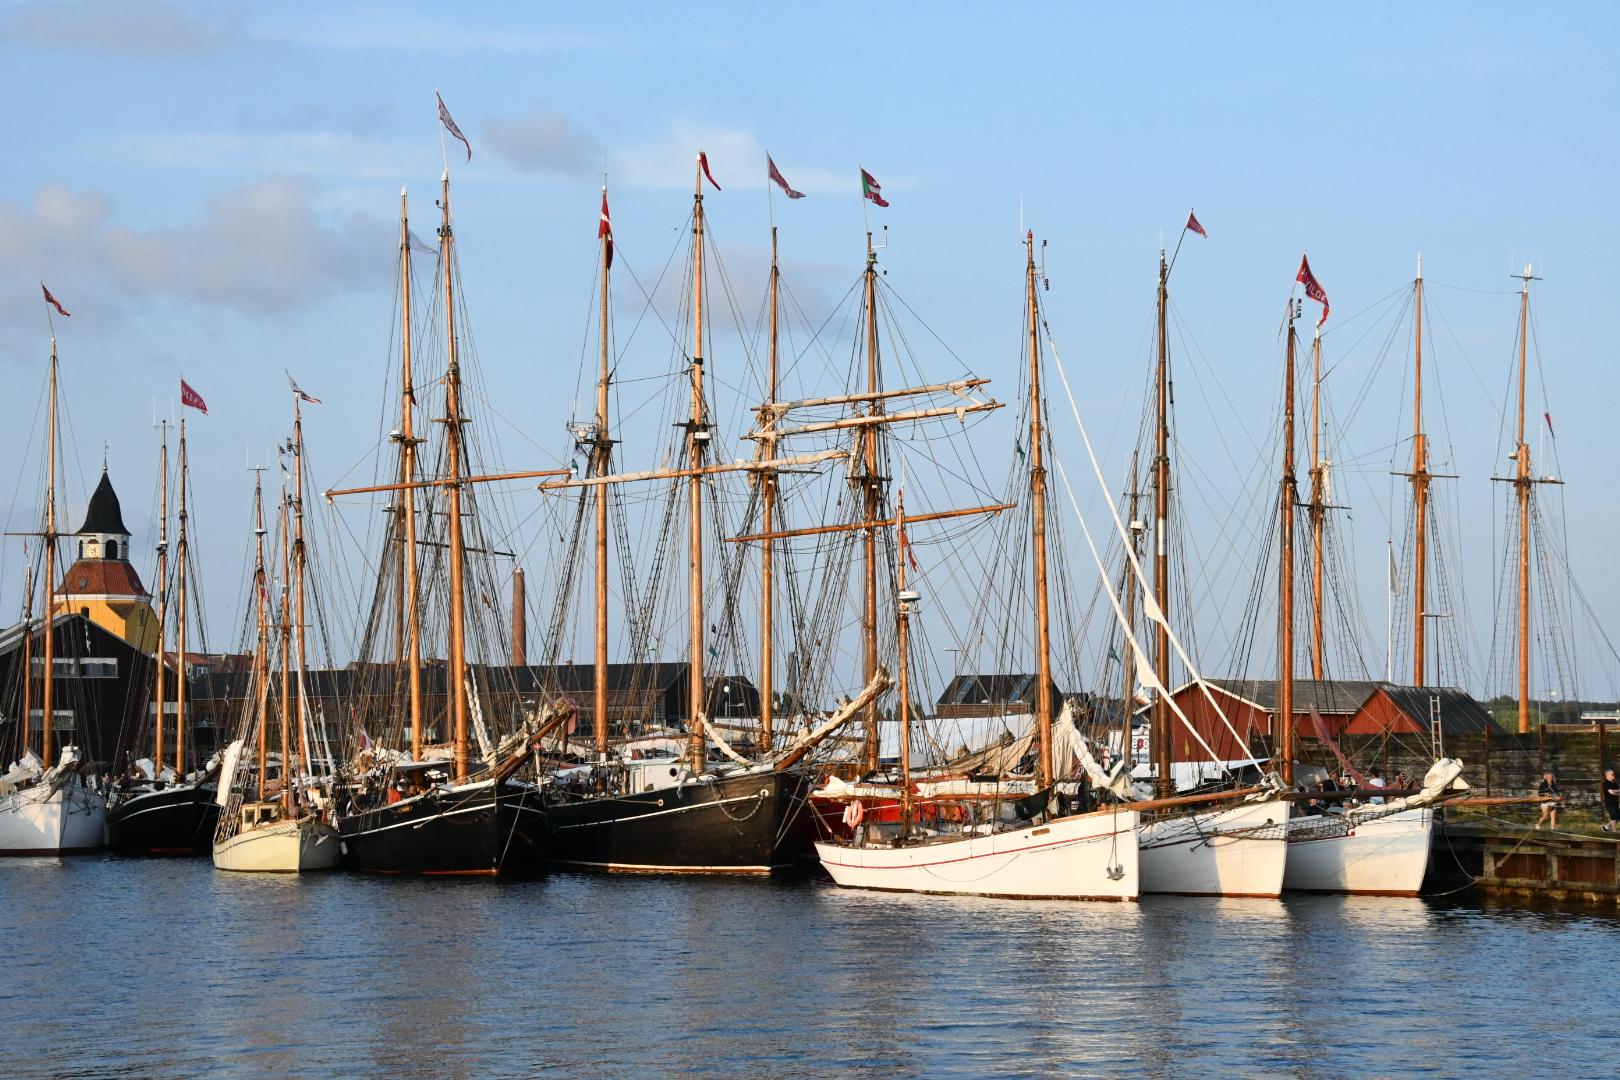 45 smukke træskibe fra Svendborg til Middelfart rundt om Fyn